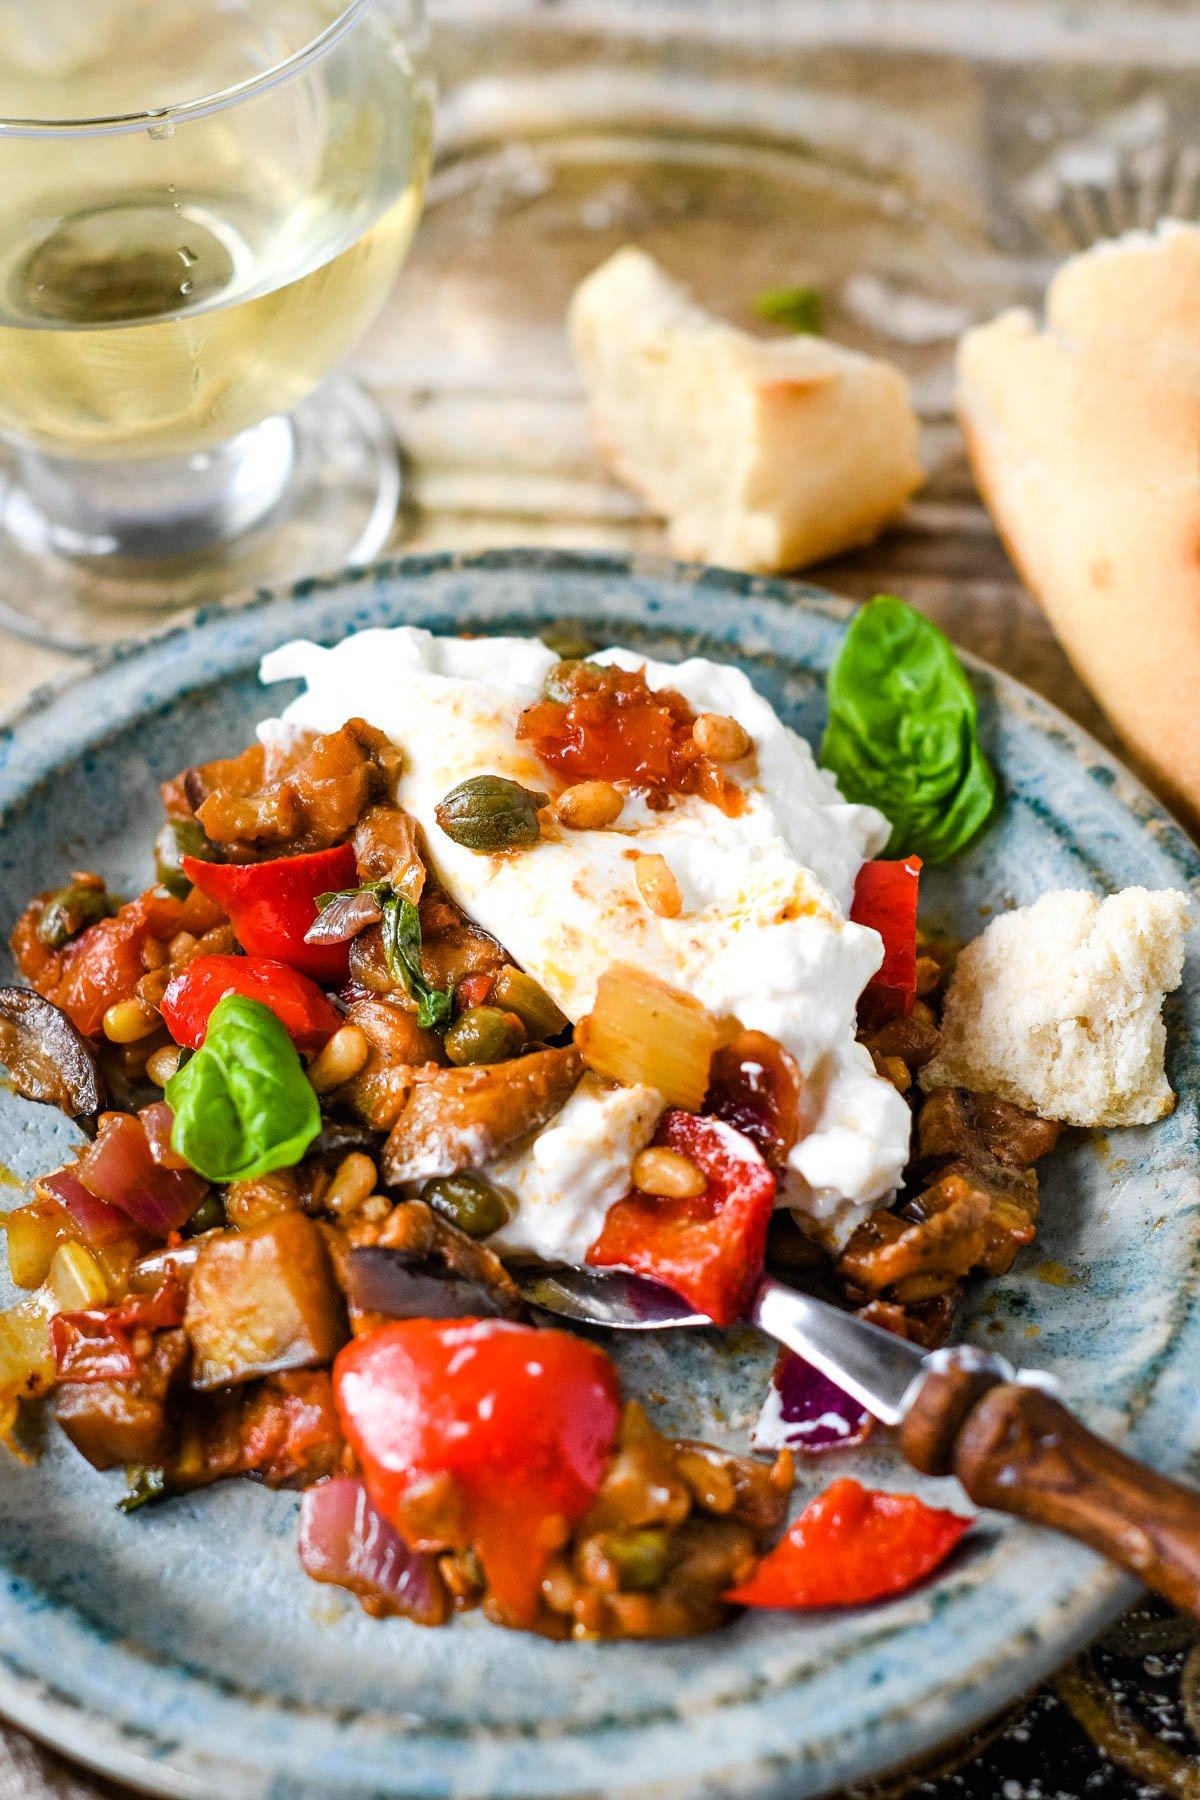 caponata in dish with fork and mozzarella cheese